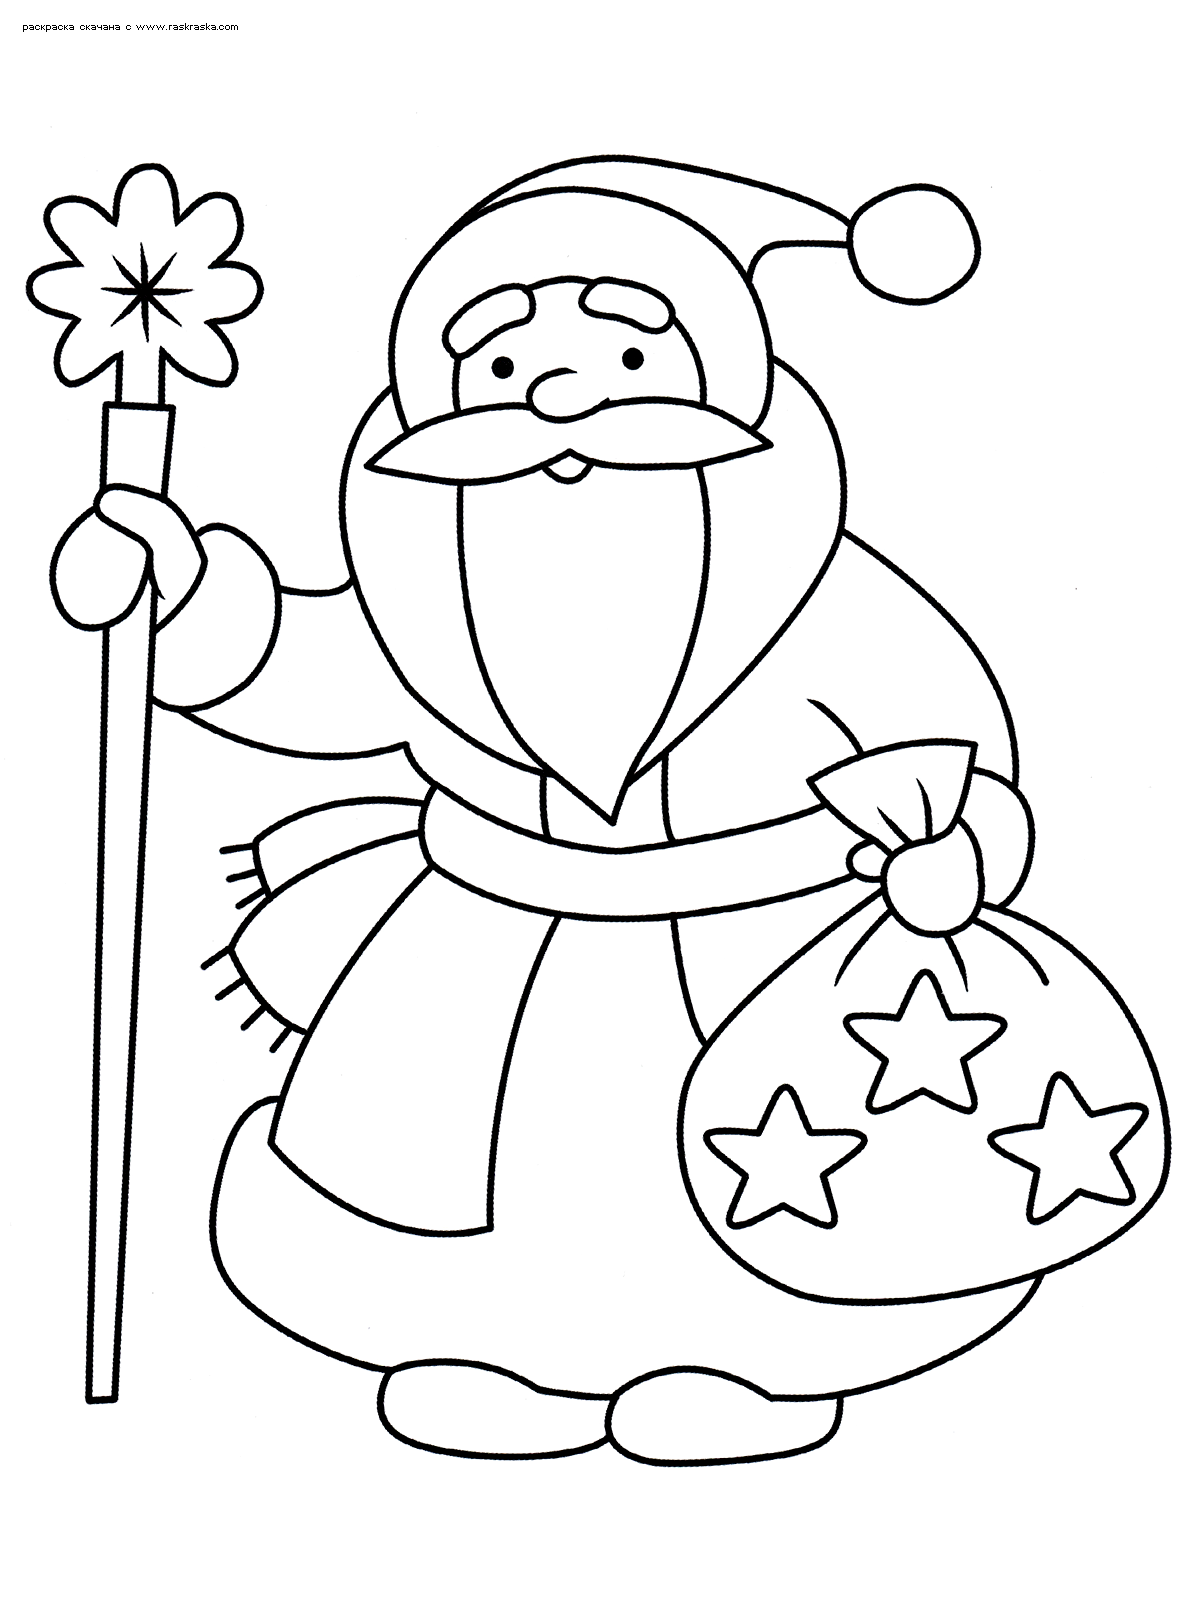 Раскраска Дед Мороз. Раскраска дед мороз